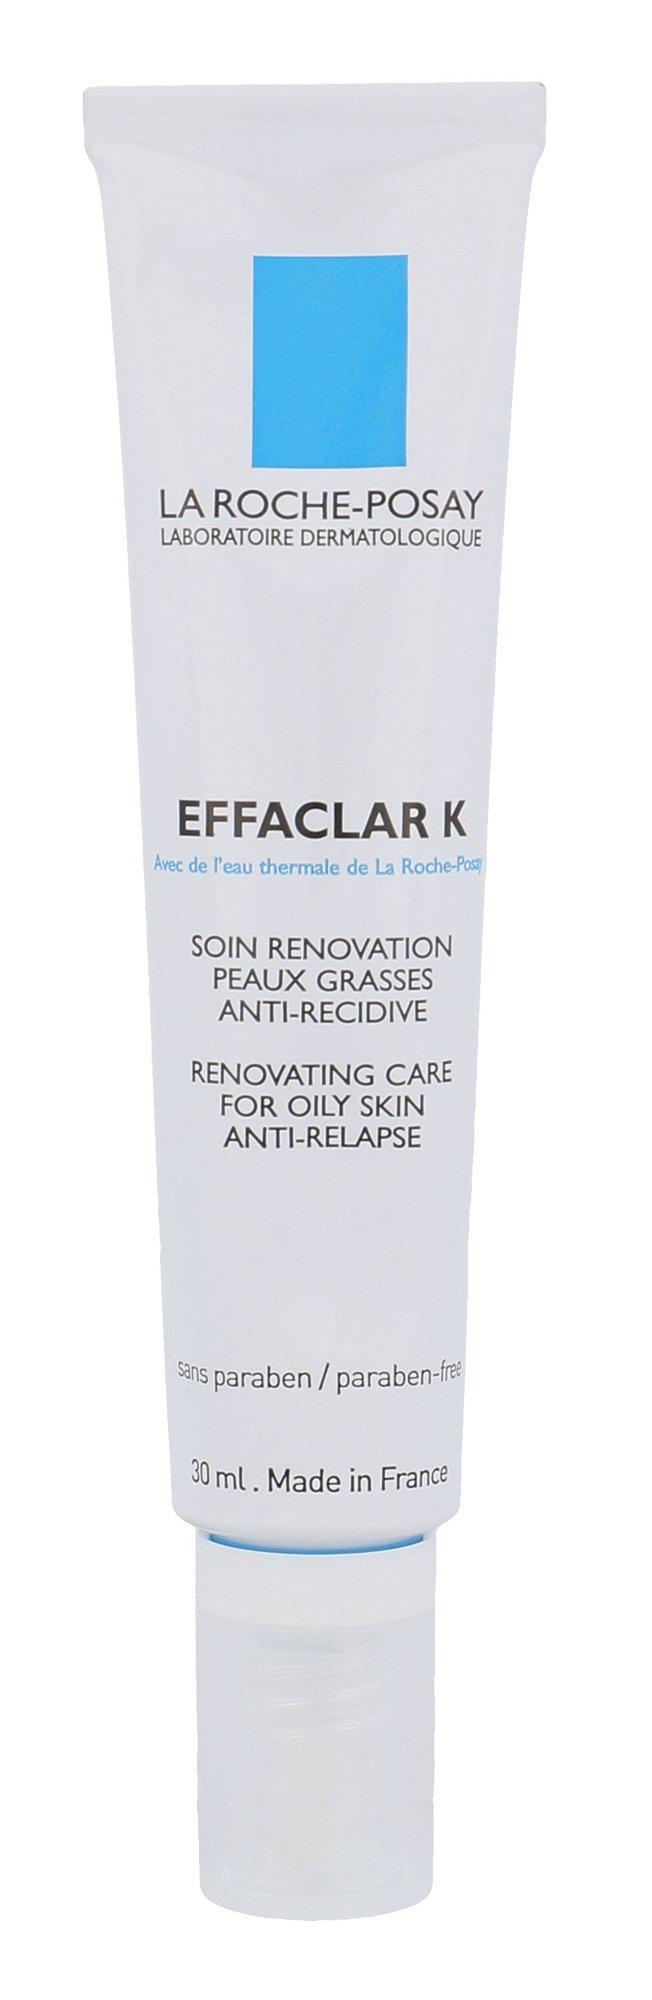 La Roche-Posay Effaclar Cosmetic 30ml  K